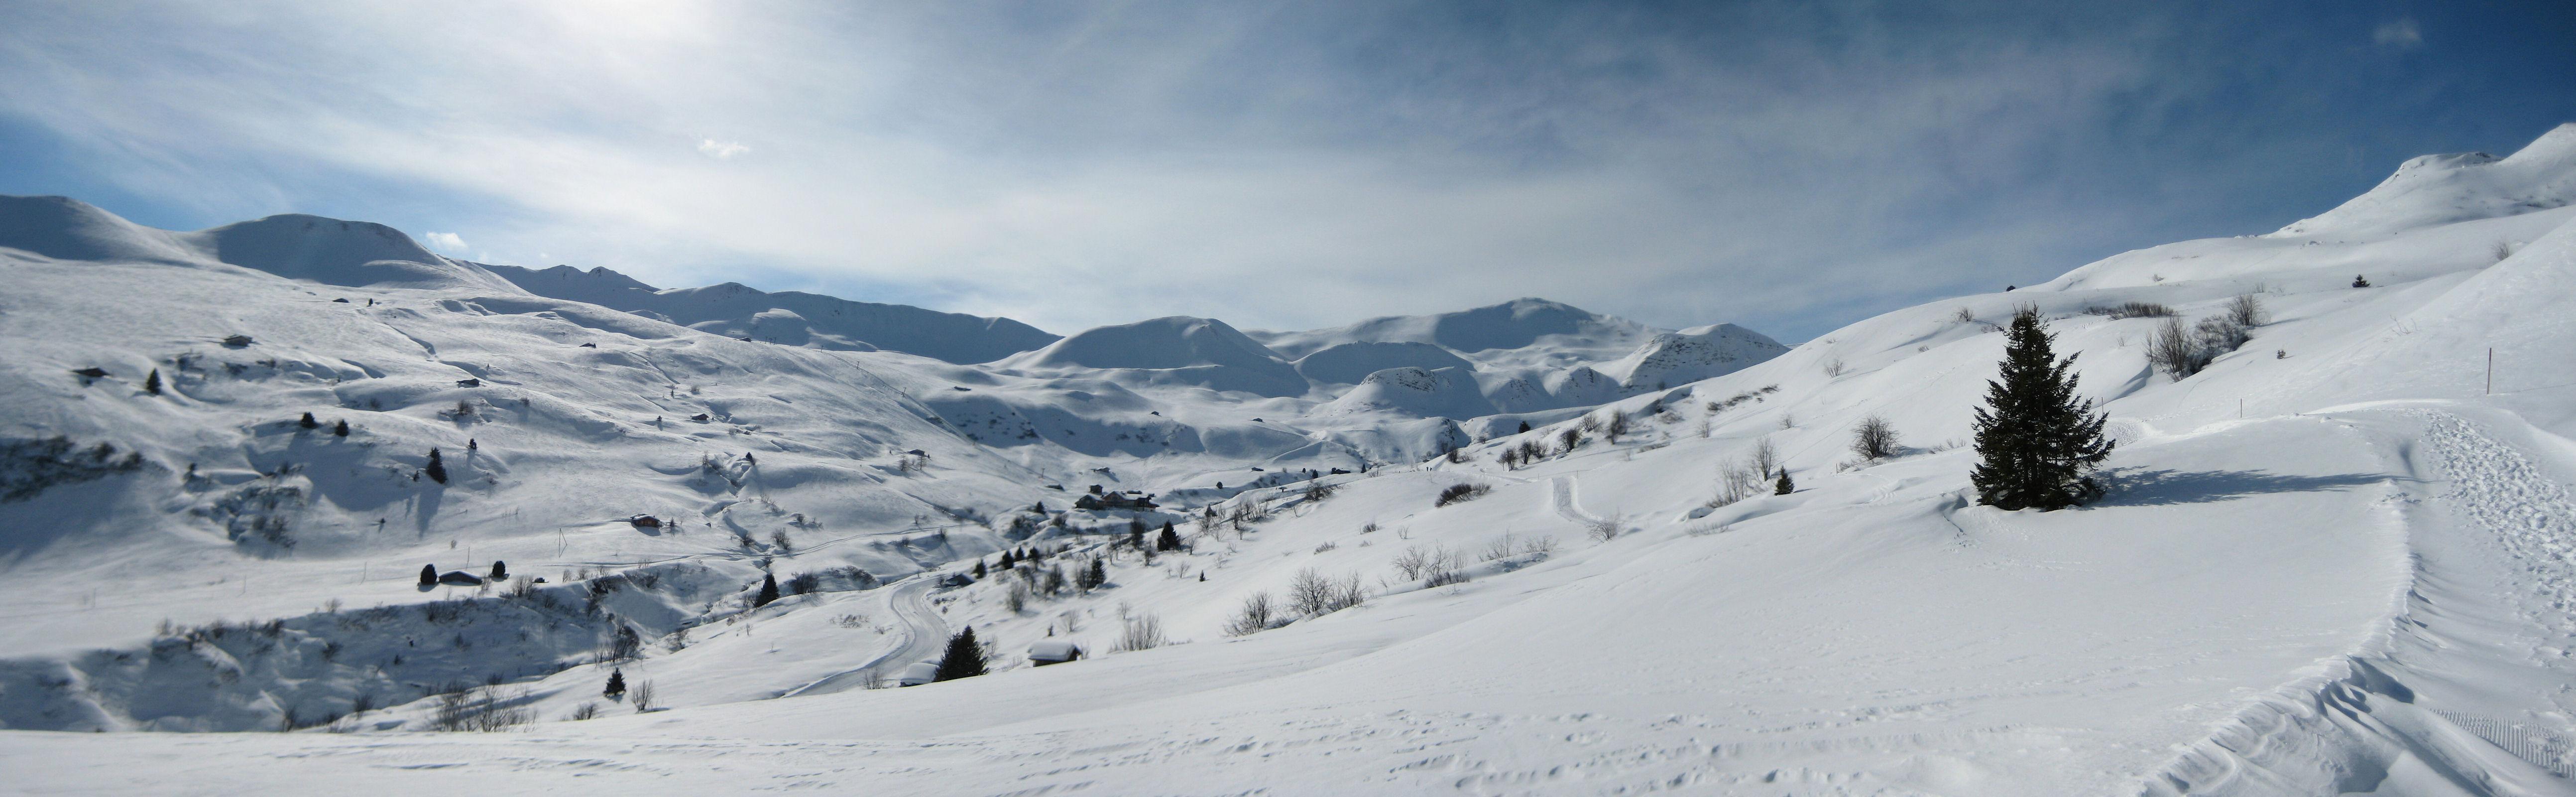 1600-IMG_2647 Panorama